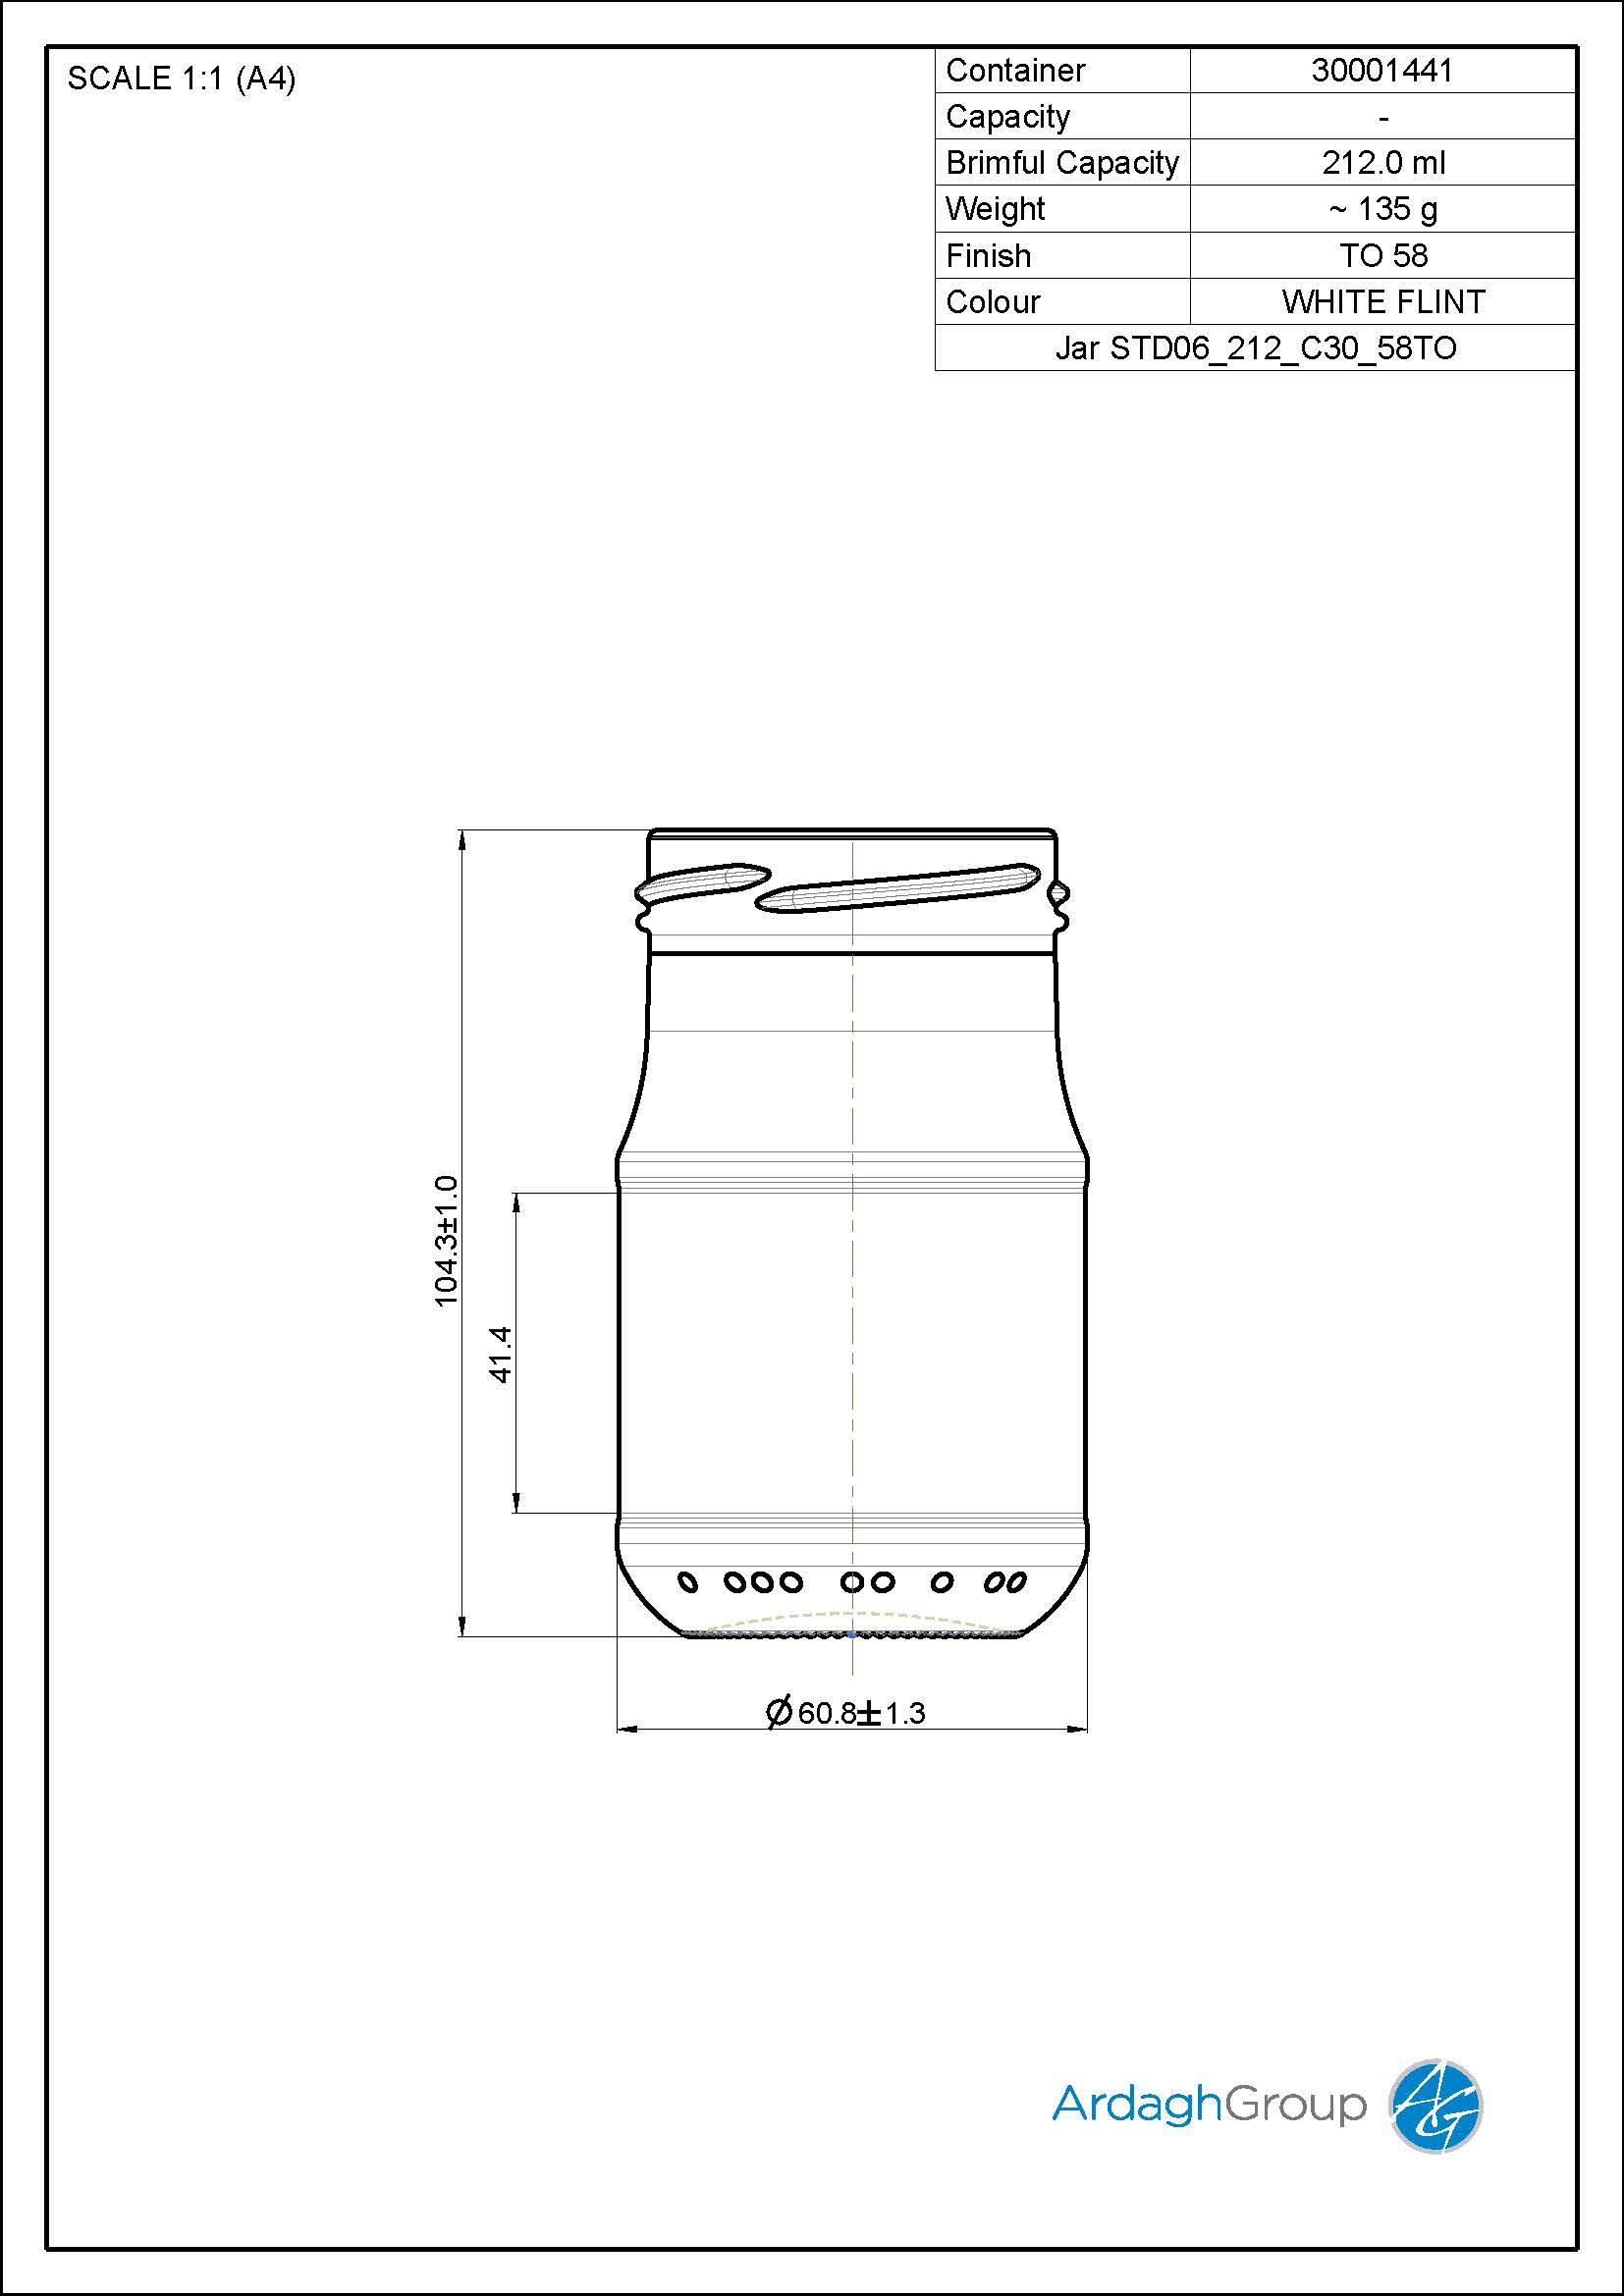 Jar STD06 212 C30 58TO